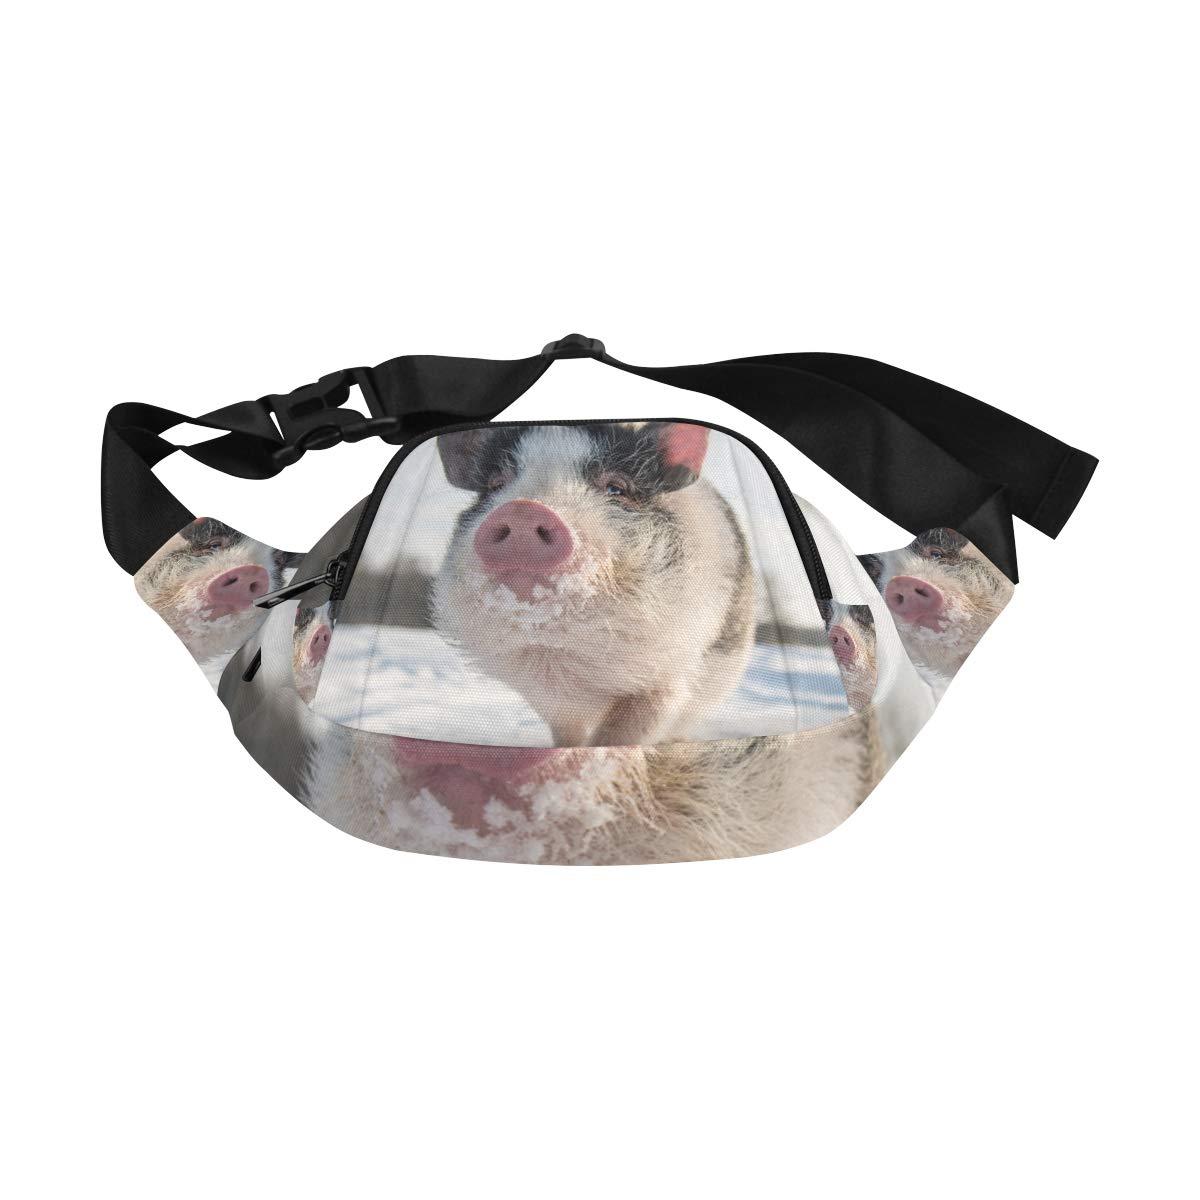 Mini Pig Walking On The Fields Fenny Packs Waist Bags Adjustable Belt Waterproof Nylon Travel Running Sport Vacation Party For Men Women Boys Girls Kids